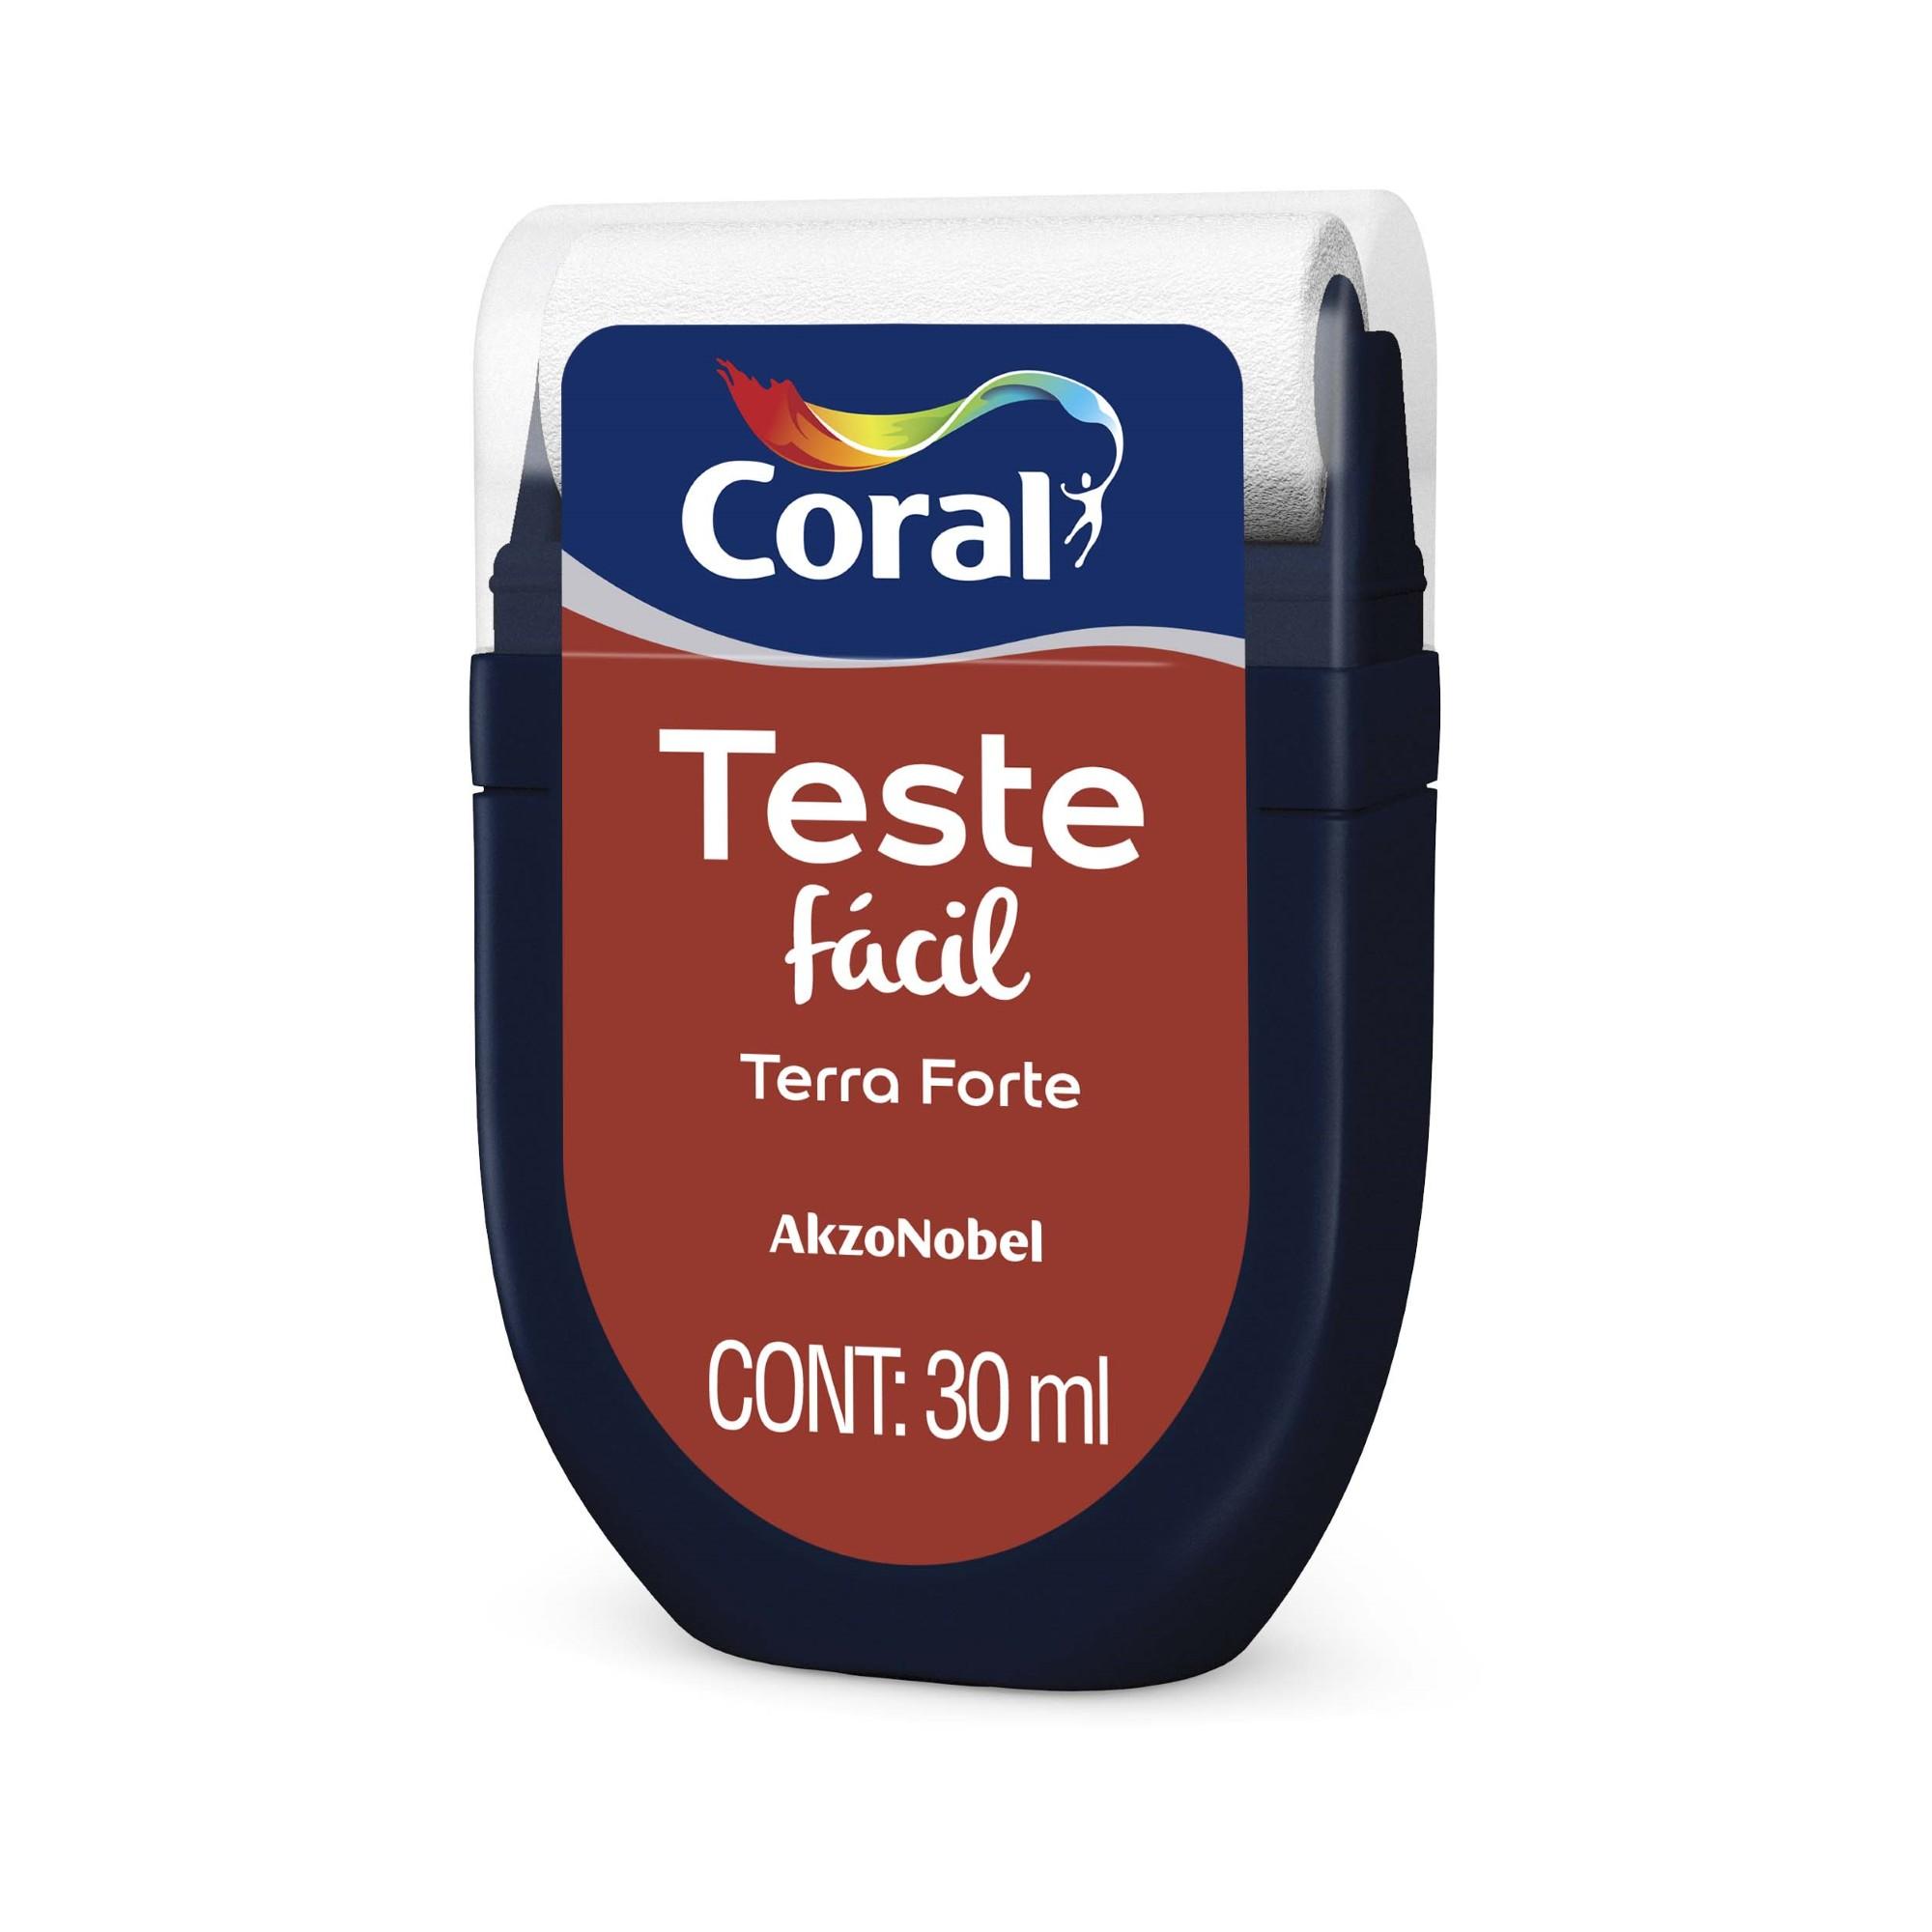 Teste Facil 30ml Terra Forte - Coral